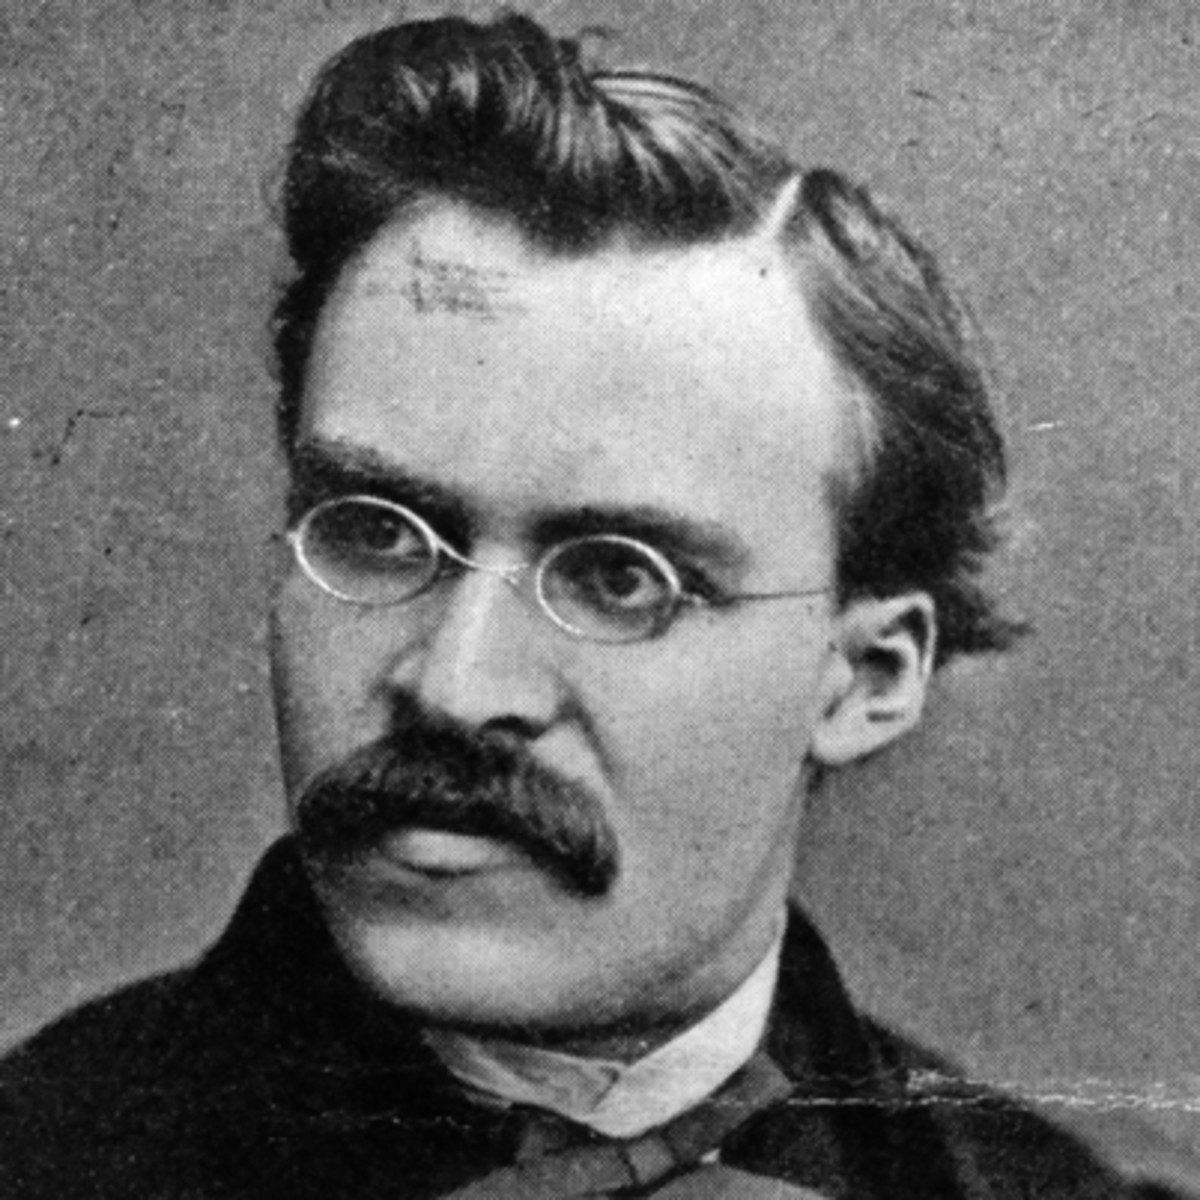 """Crepúsculo dos ídolos"", de Friederich Nietzsche"